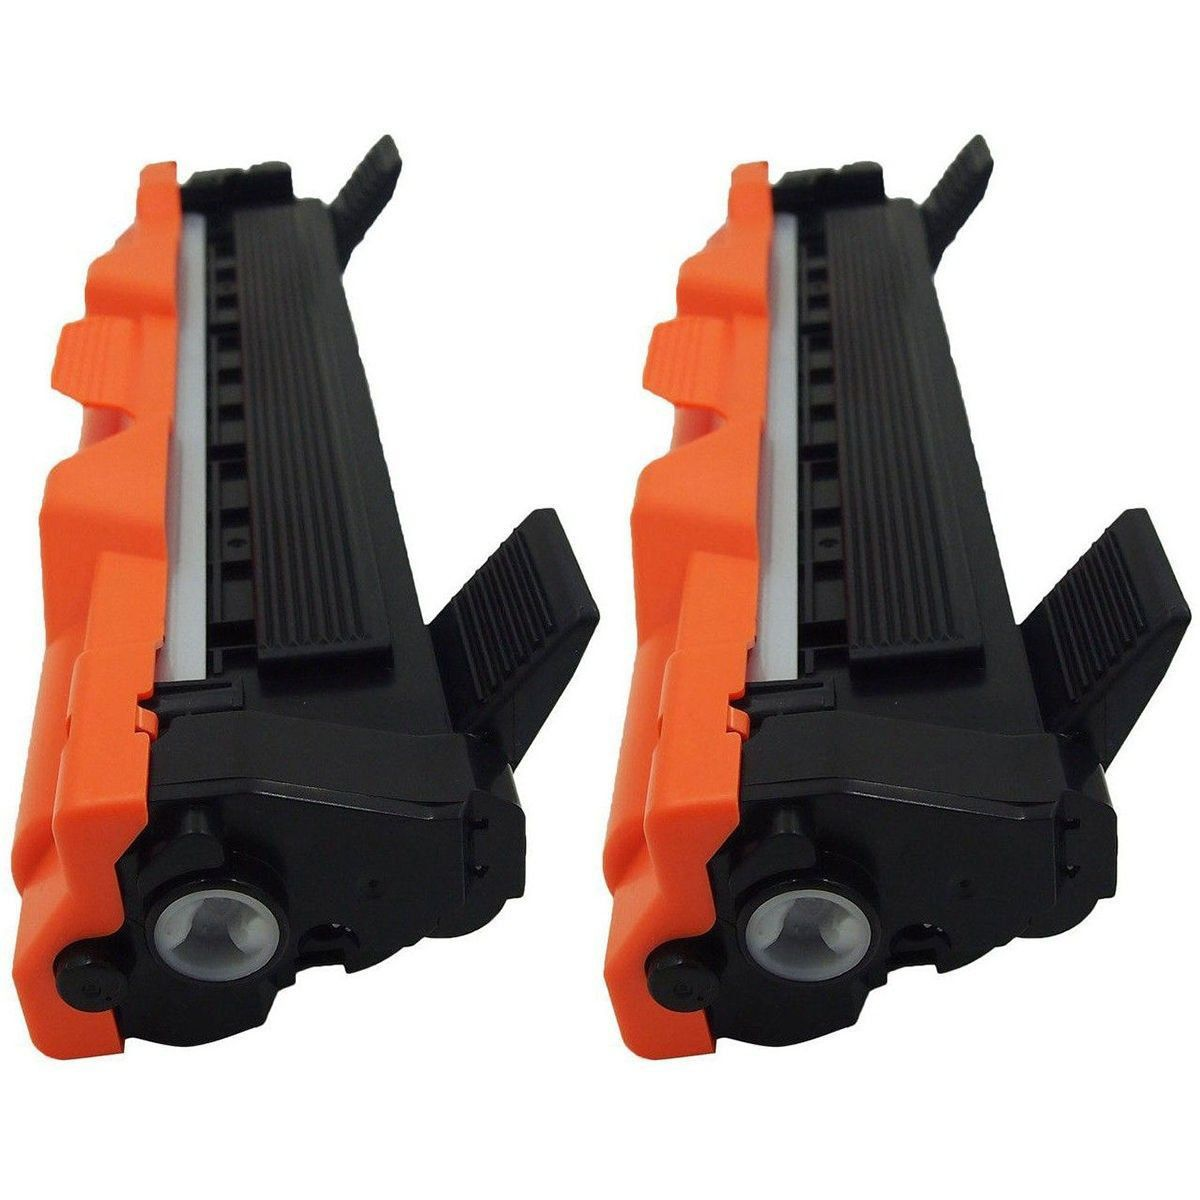 Compatível: Kit 2x Toner TN-1000 TN-1060 para Brother DCP-1617 DCP-1512 1612w HL1212 HL1212w DCP1617nw / Preto / 1.000